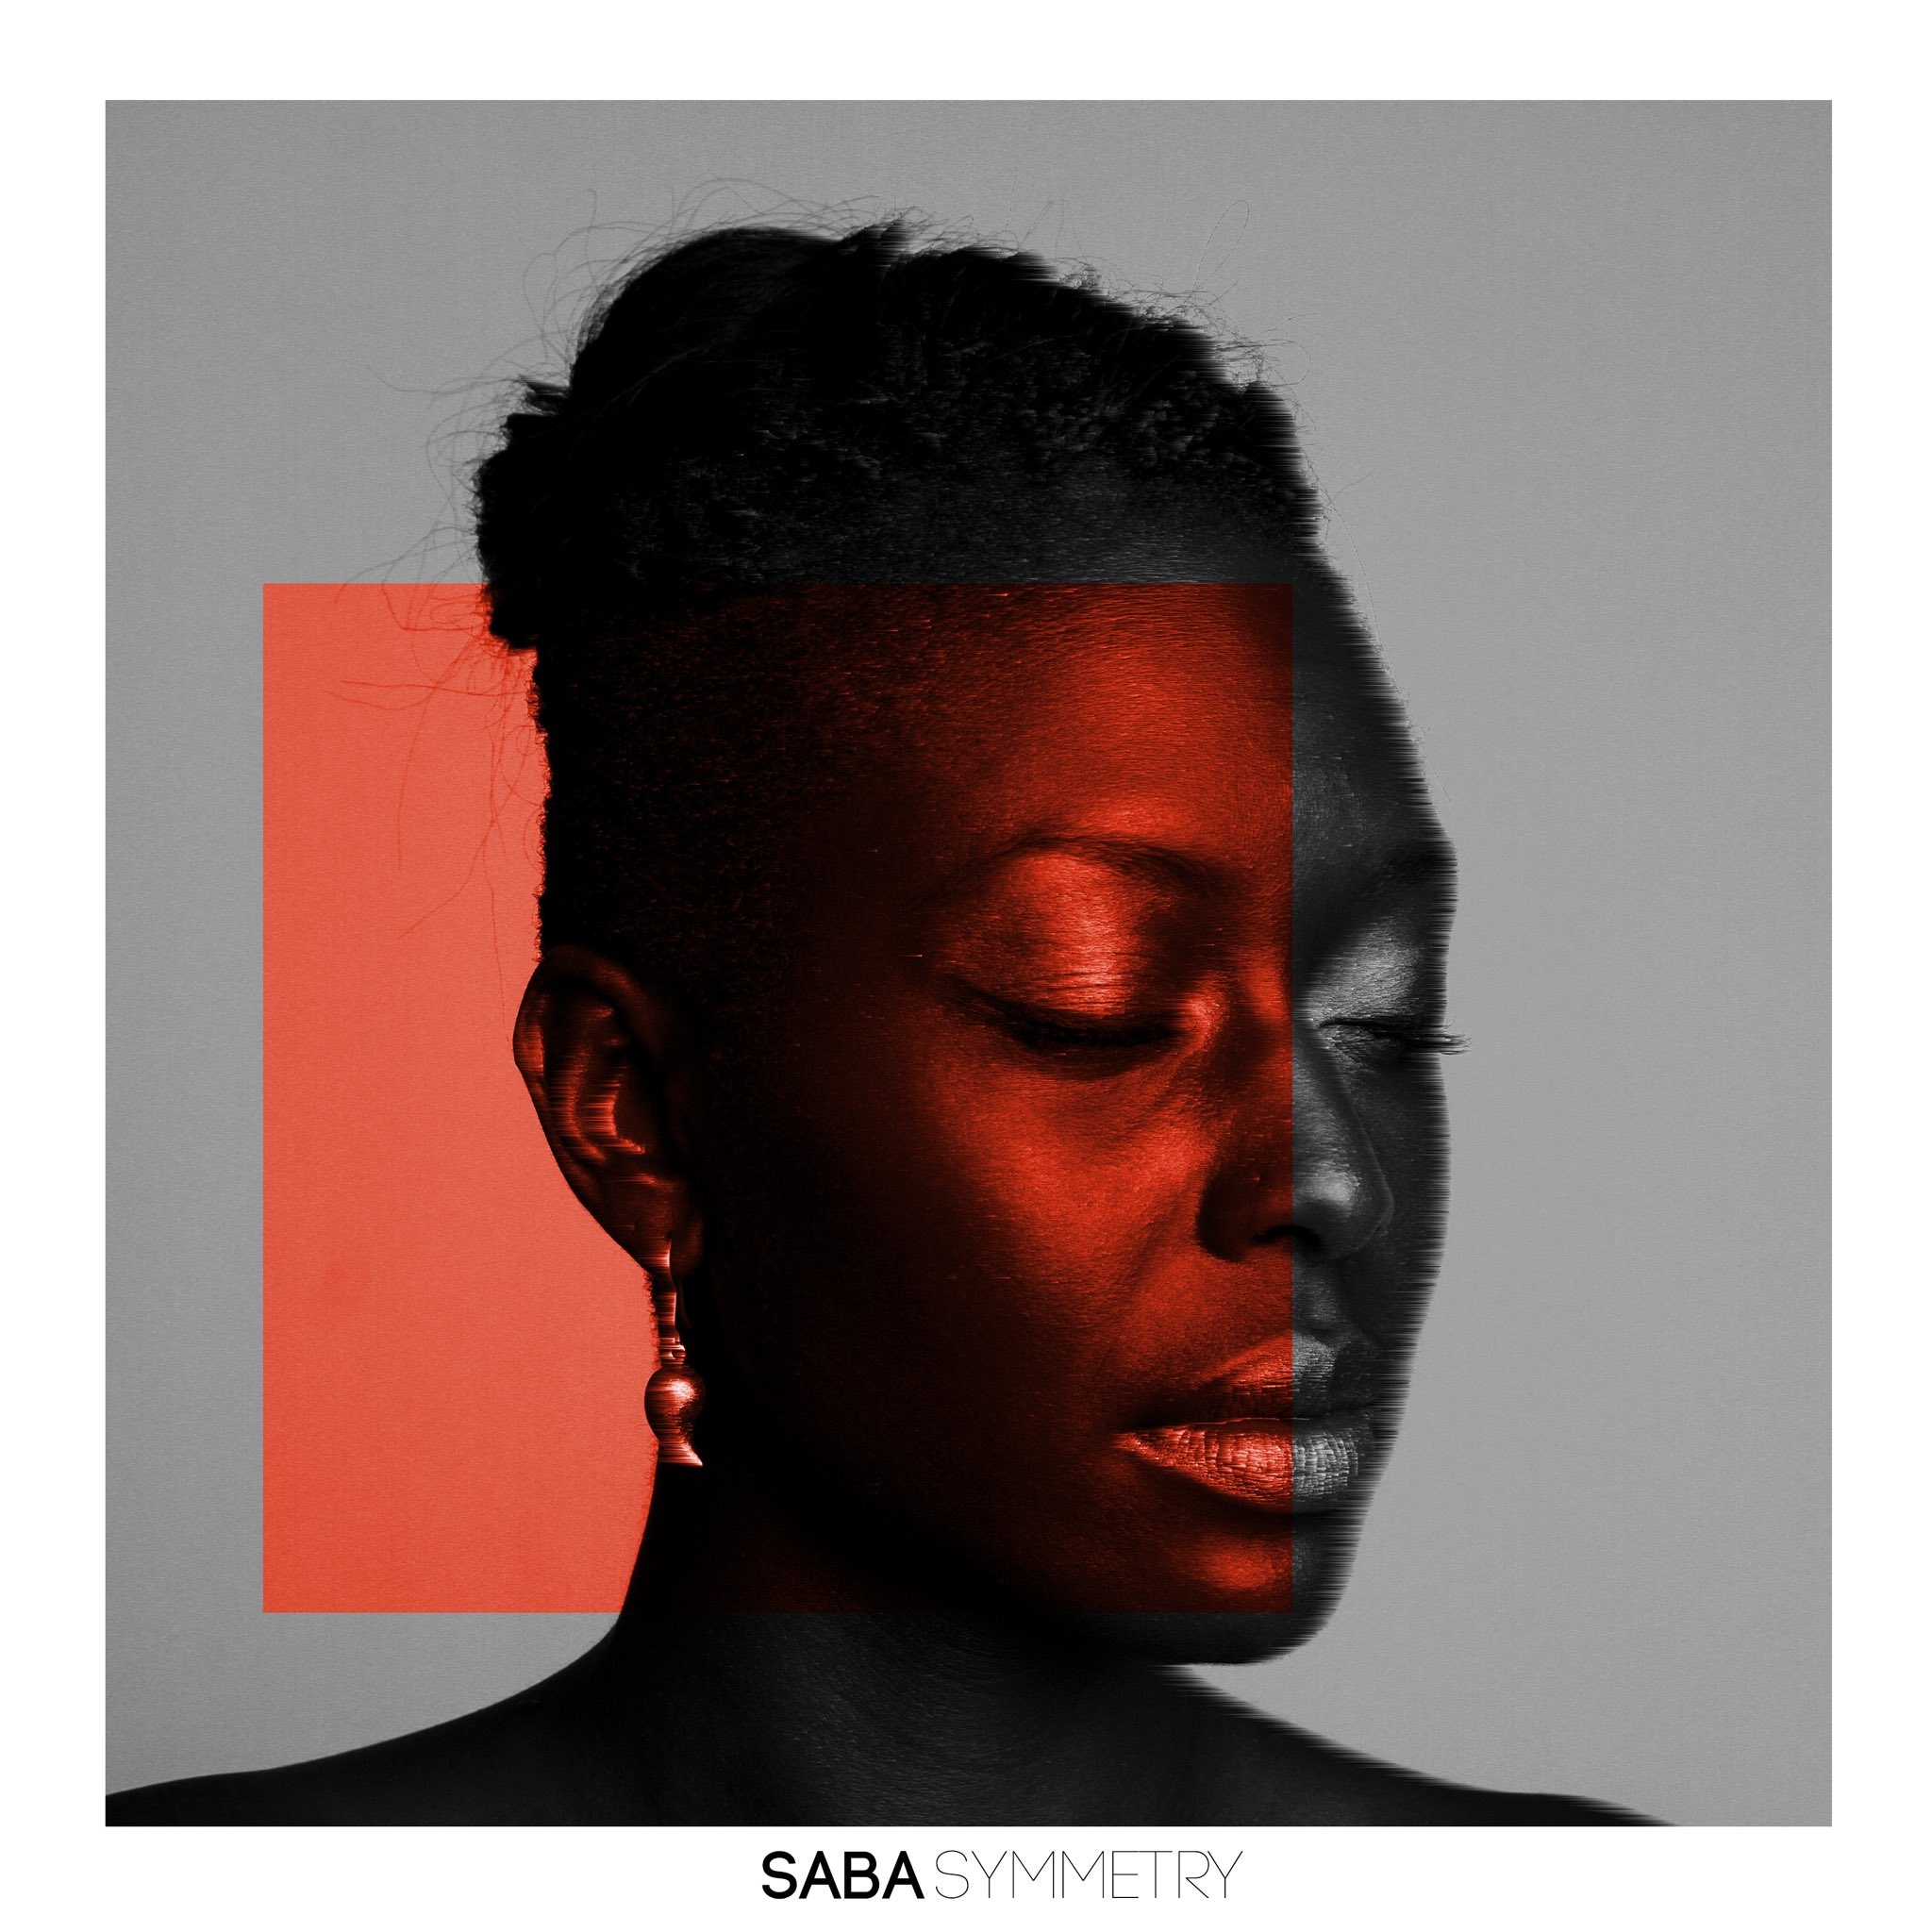 RT @sabaPIVOT: Listen to #Symmetry out now via @zanelowe on @AppleMusic https://t.co/8l9axMakQM https://t.co/aoiebskM2U